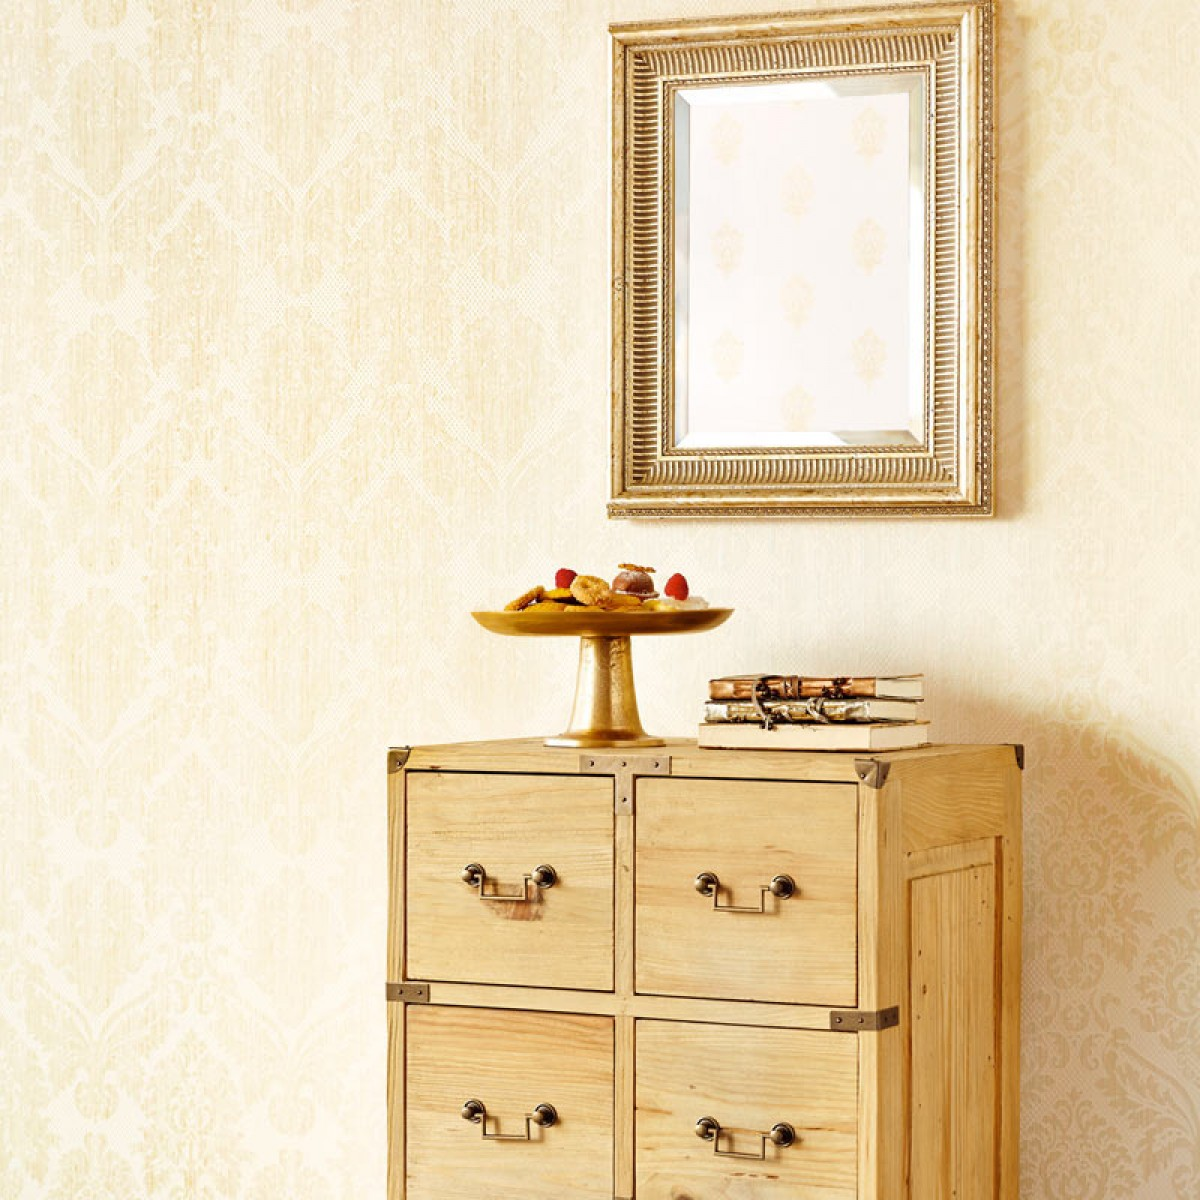 Tapet lavabil Chambord 36100, 5.2mp / rolă, Eijffinger